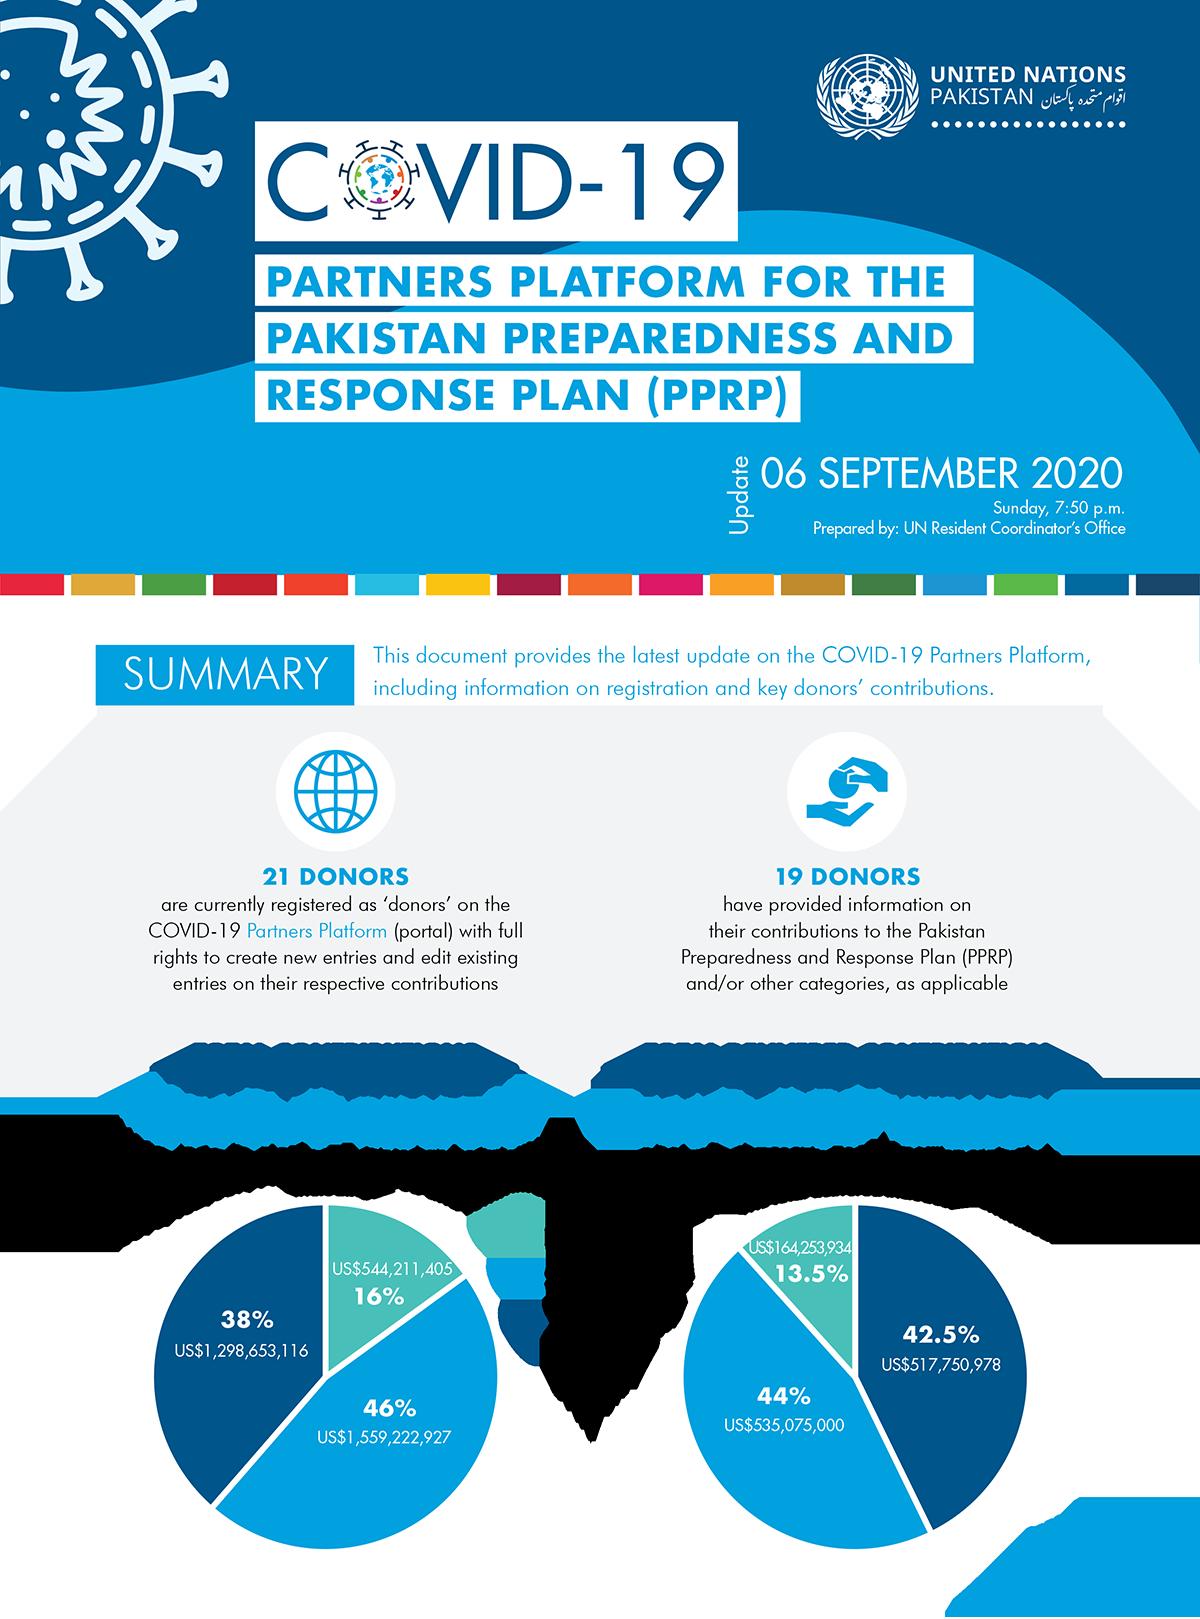 Partners Platform for the Pakistan Preparedness and Response Plan (PPRP)